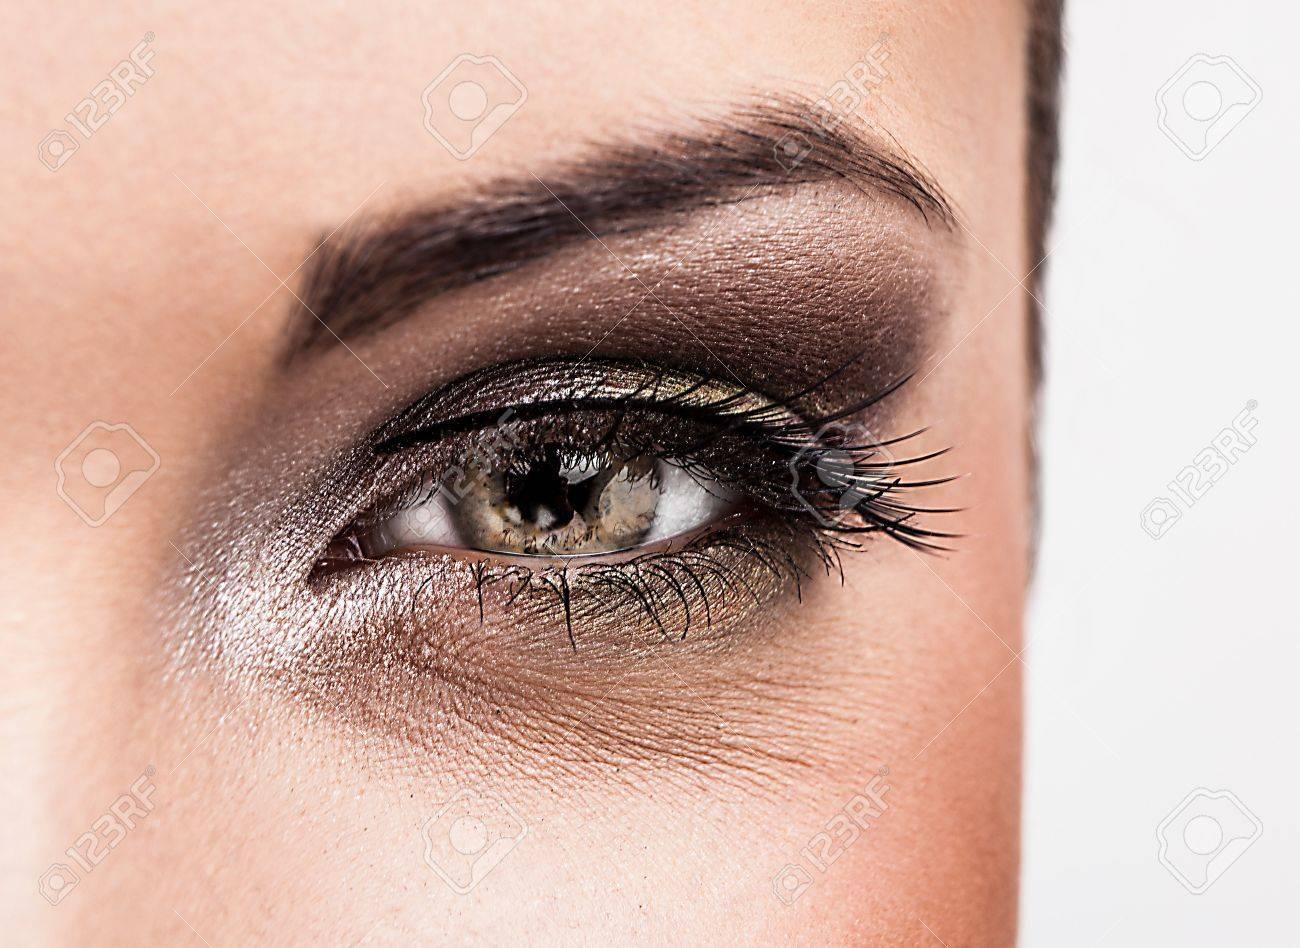 Woman eye with beautiful makeup - 15577110